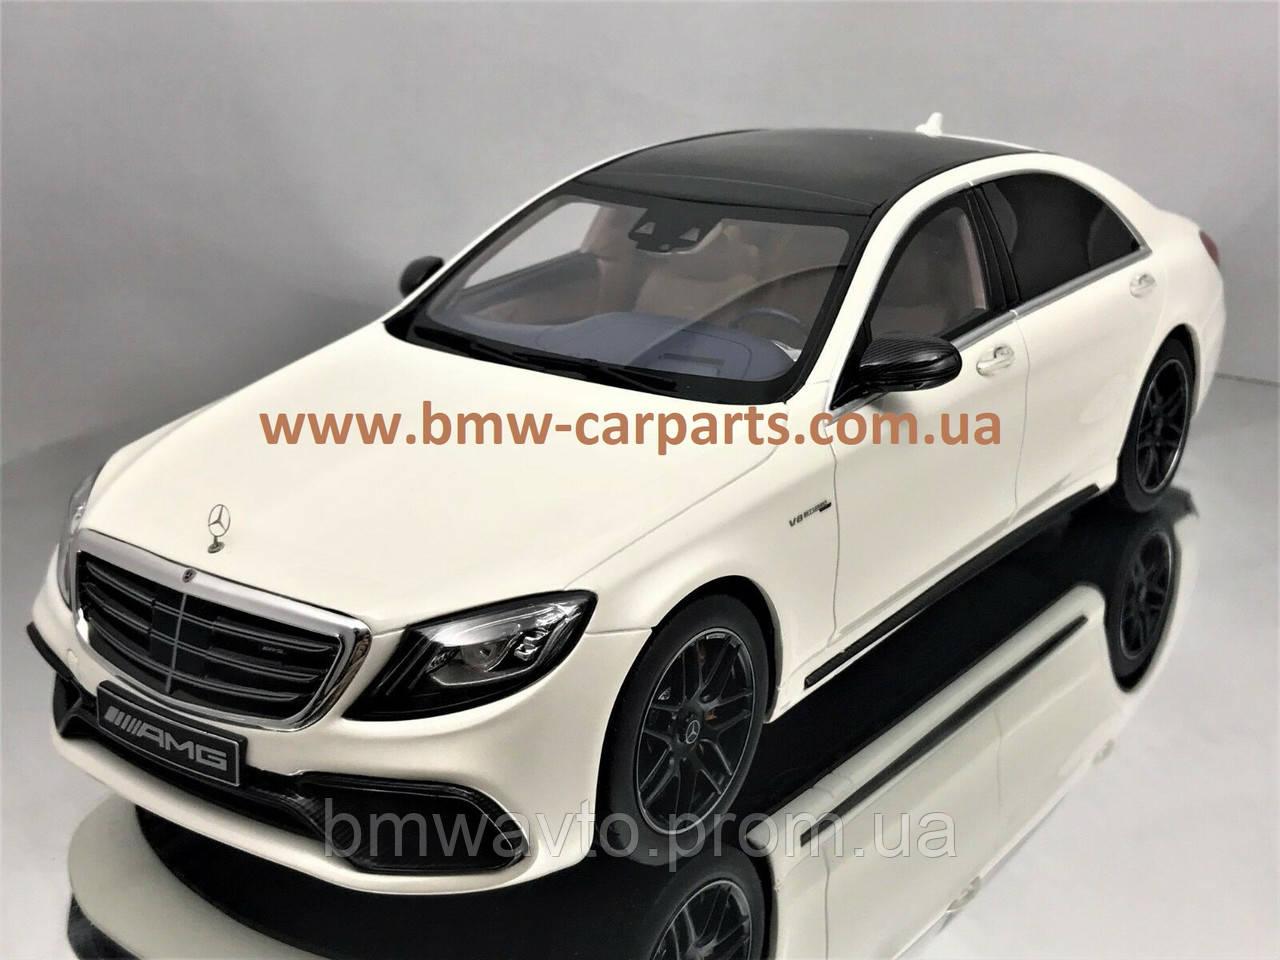 Модель Mercedes-AMG S 63 long-wheelbase, Designo Diamond White Bright, 1:18 Scale